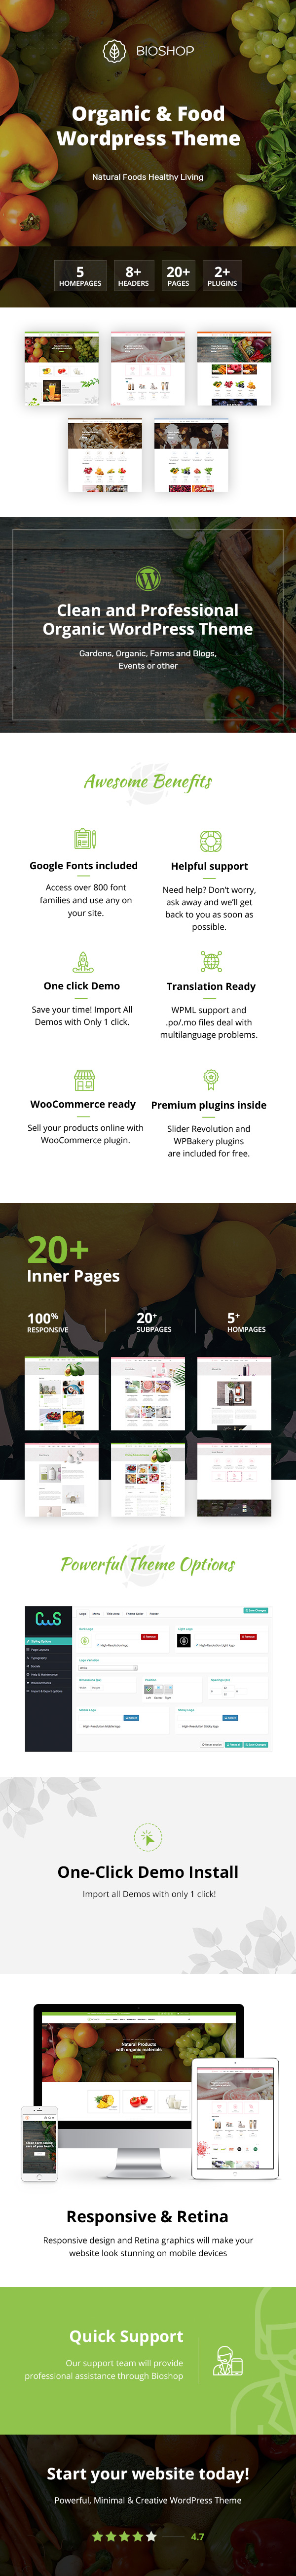 organic-and-health-wordpress-theme.jpg